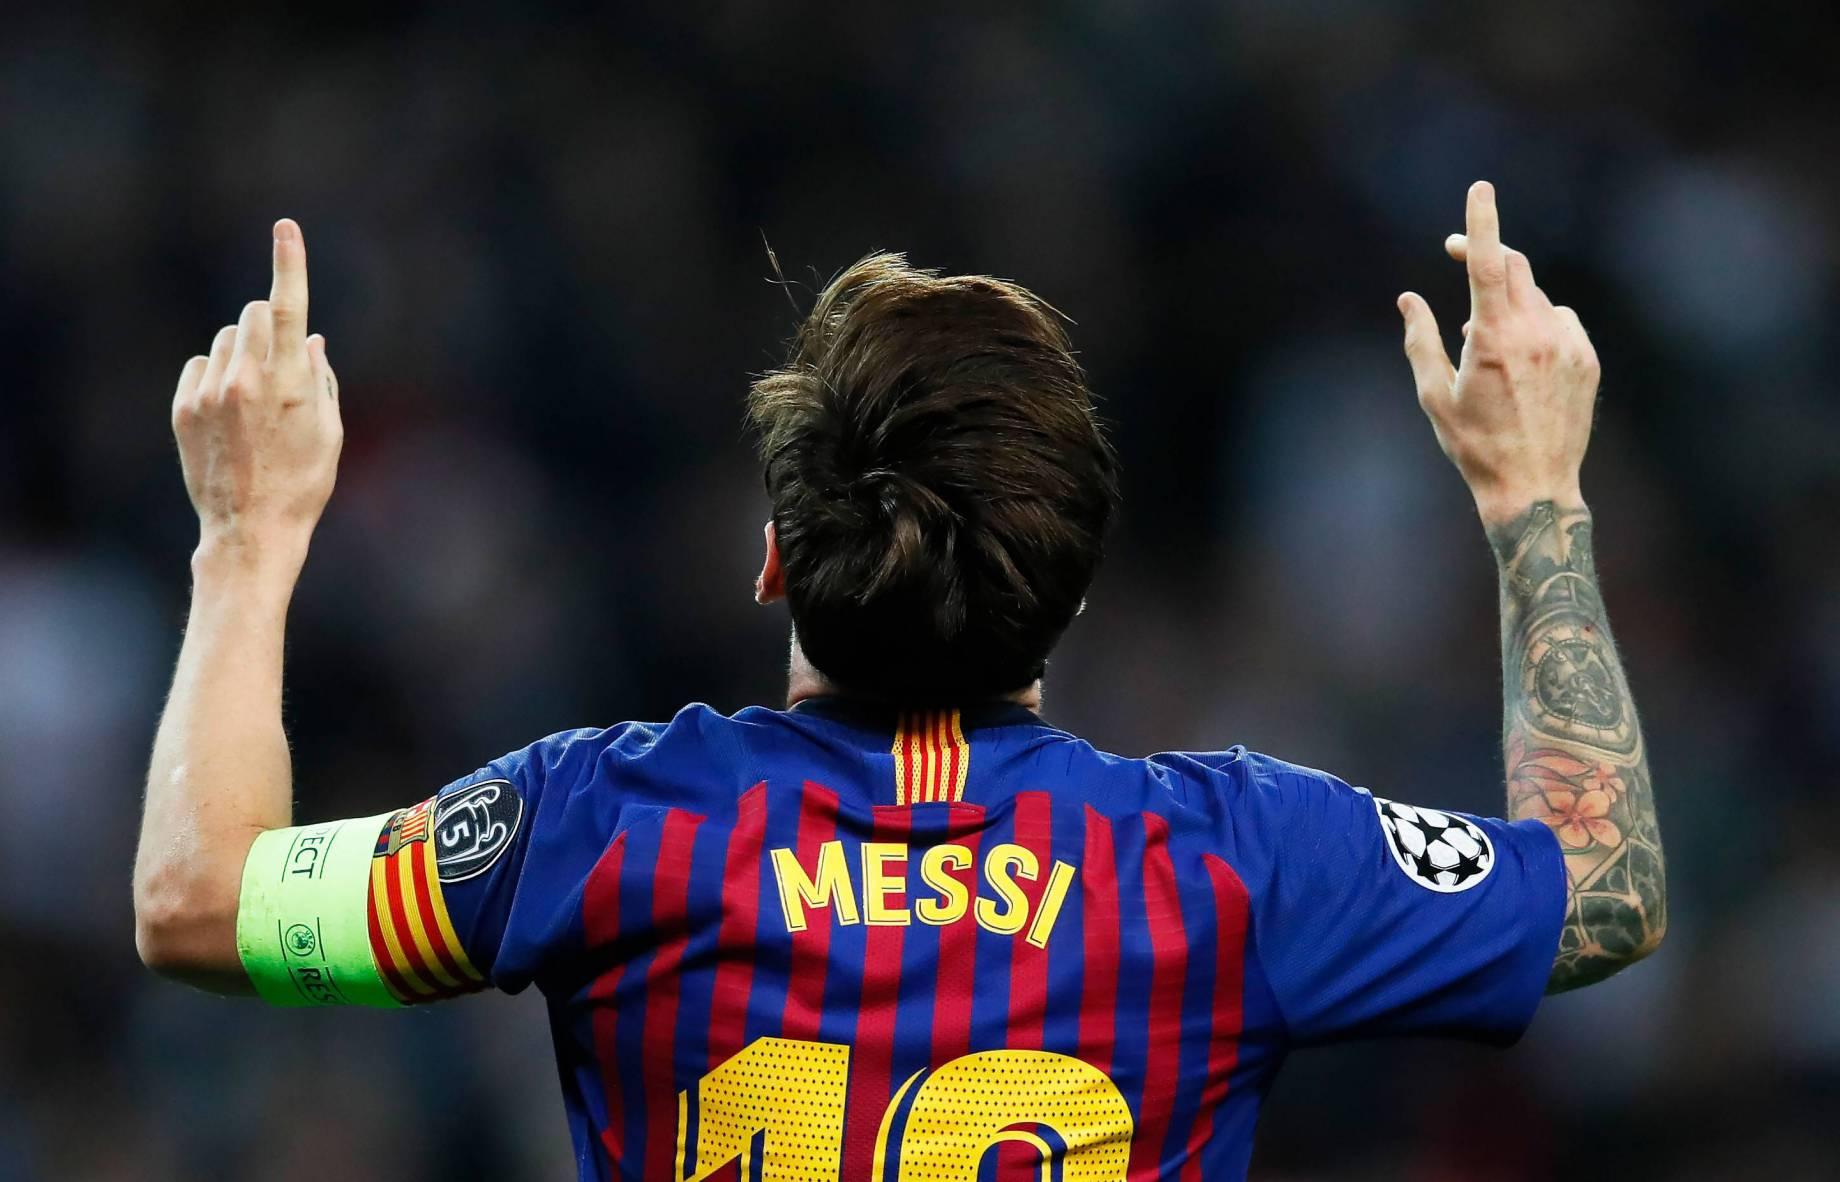 Messi IMAGE